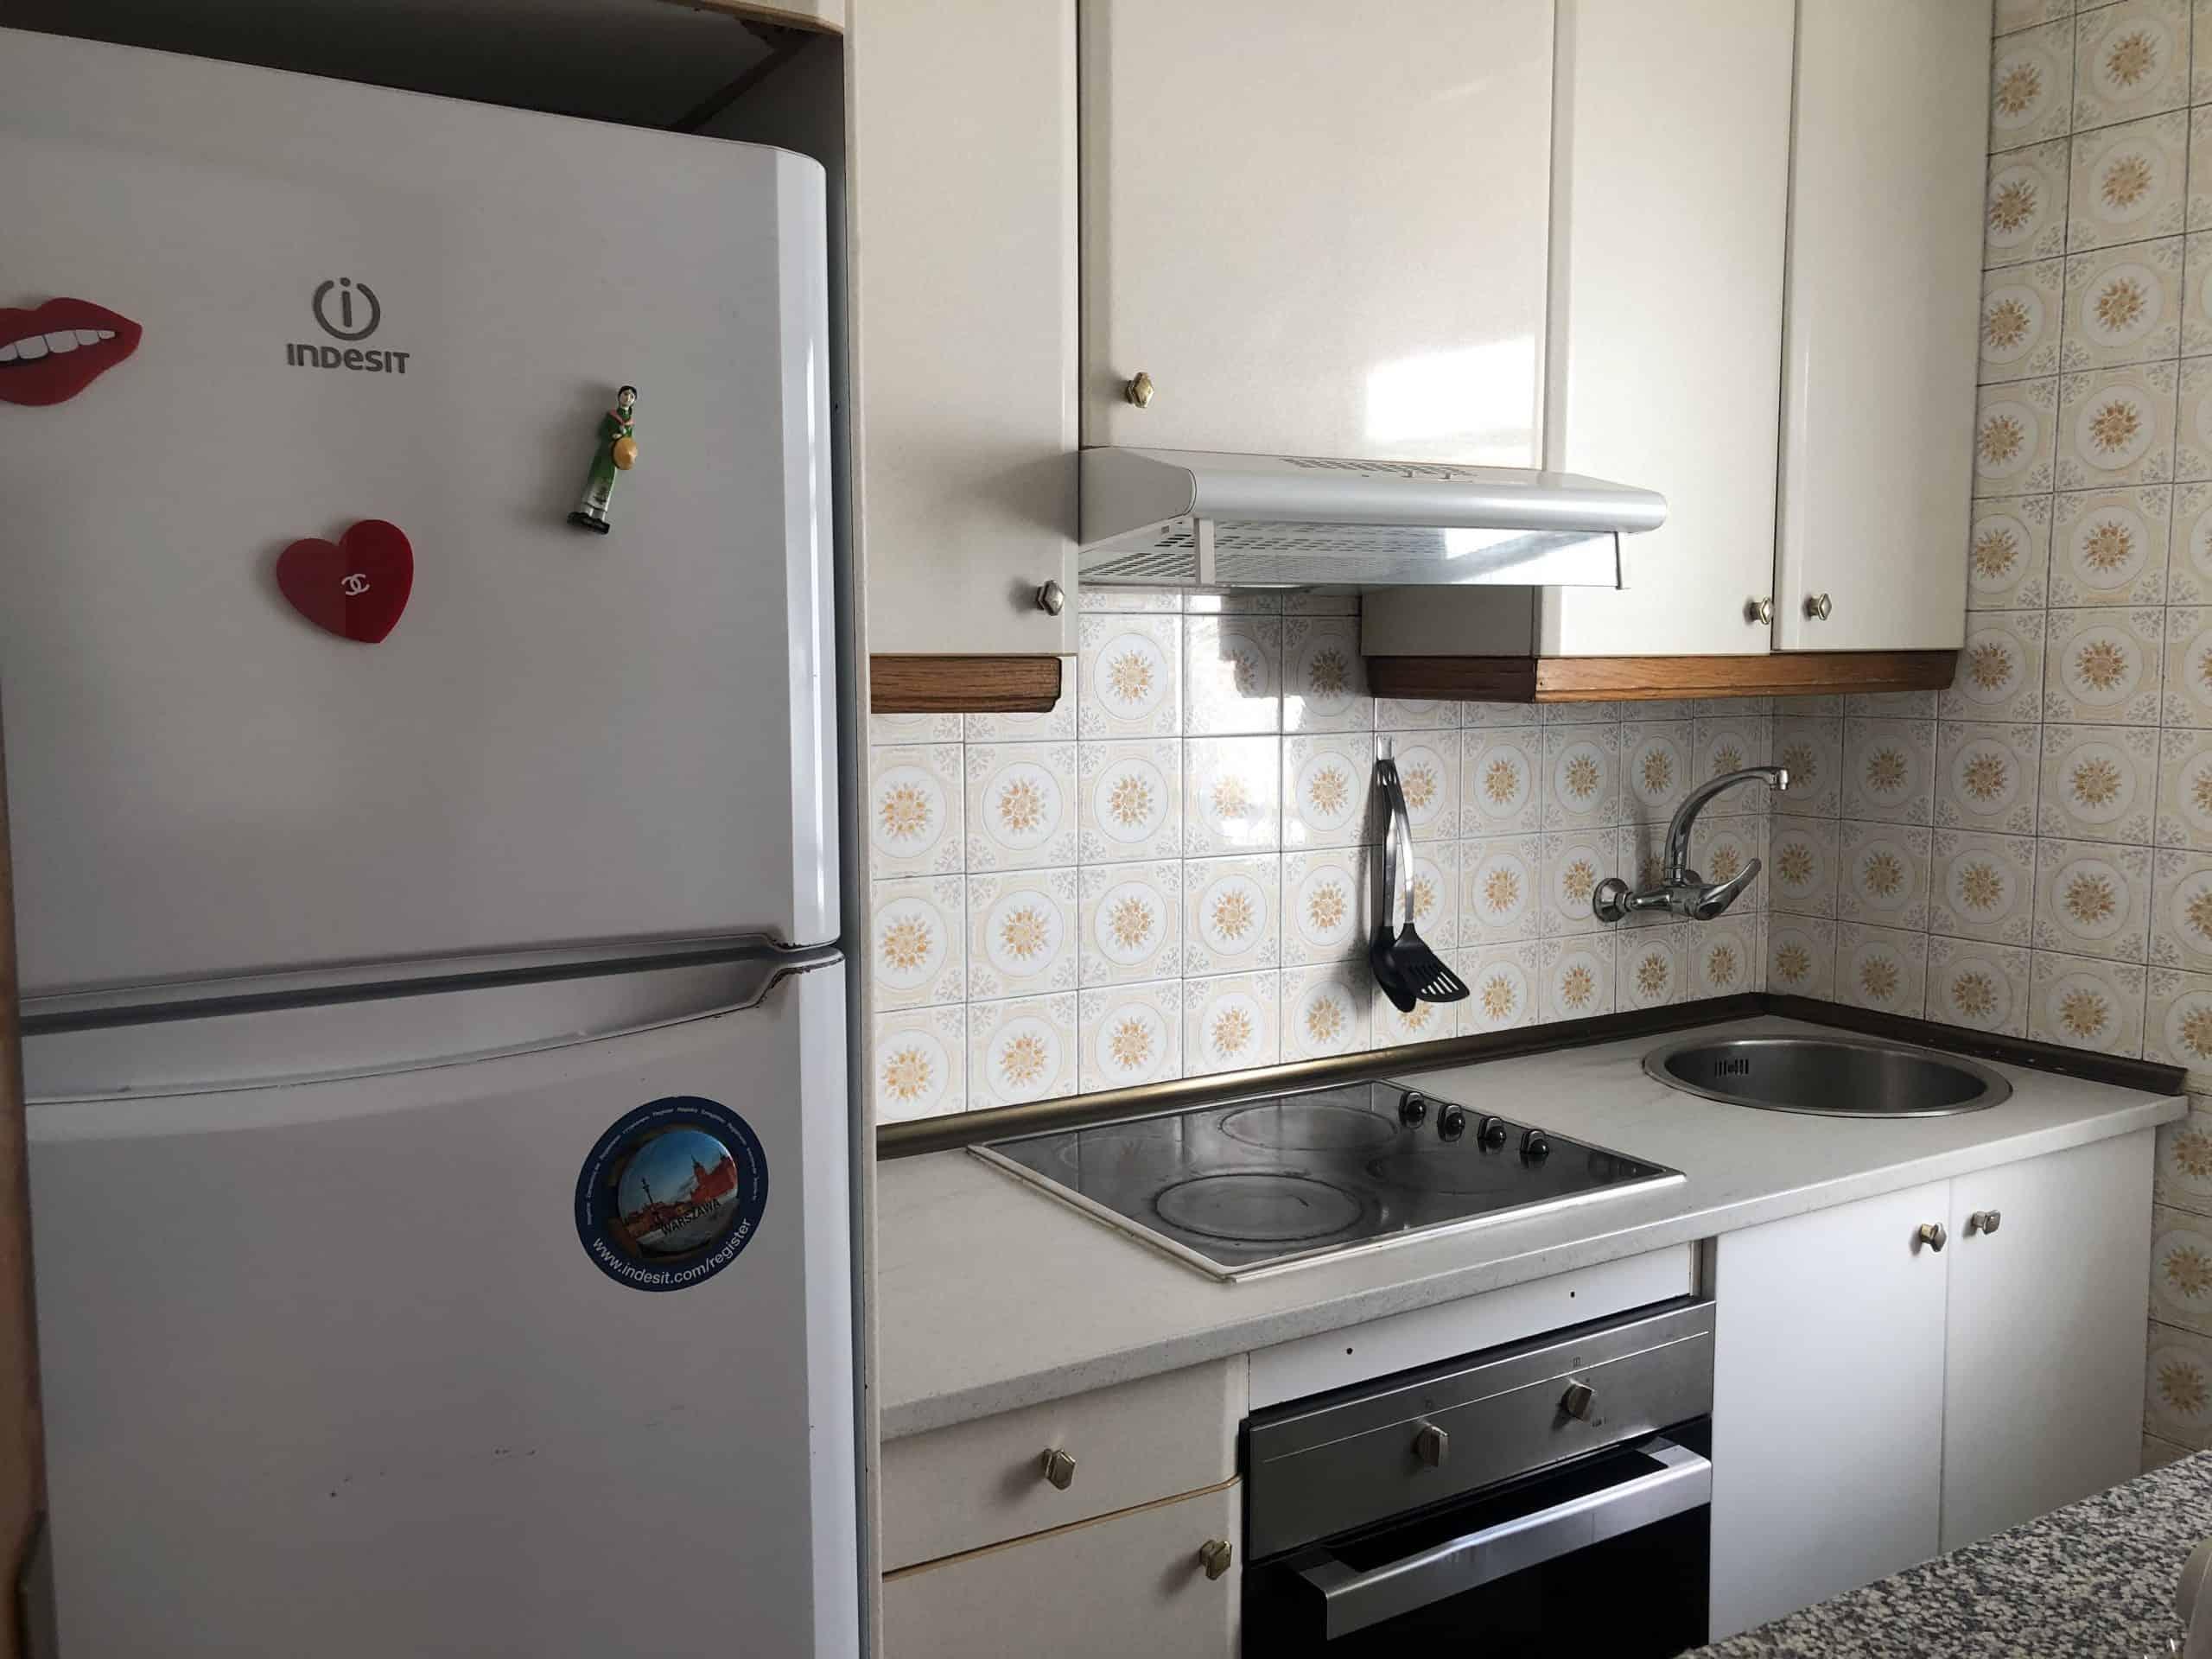 Agencia Inmobiliaria de Madrid-FUTUROCASA-Zona ARGANZUELA-EMBAJADORES-LEGAZPI -calle Embajadores- cocina 4